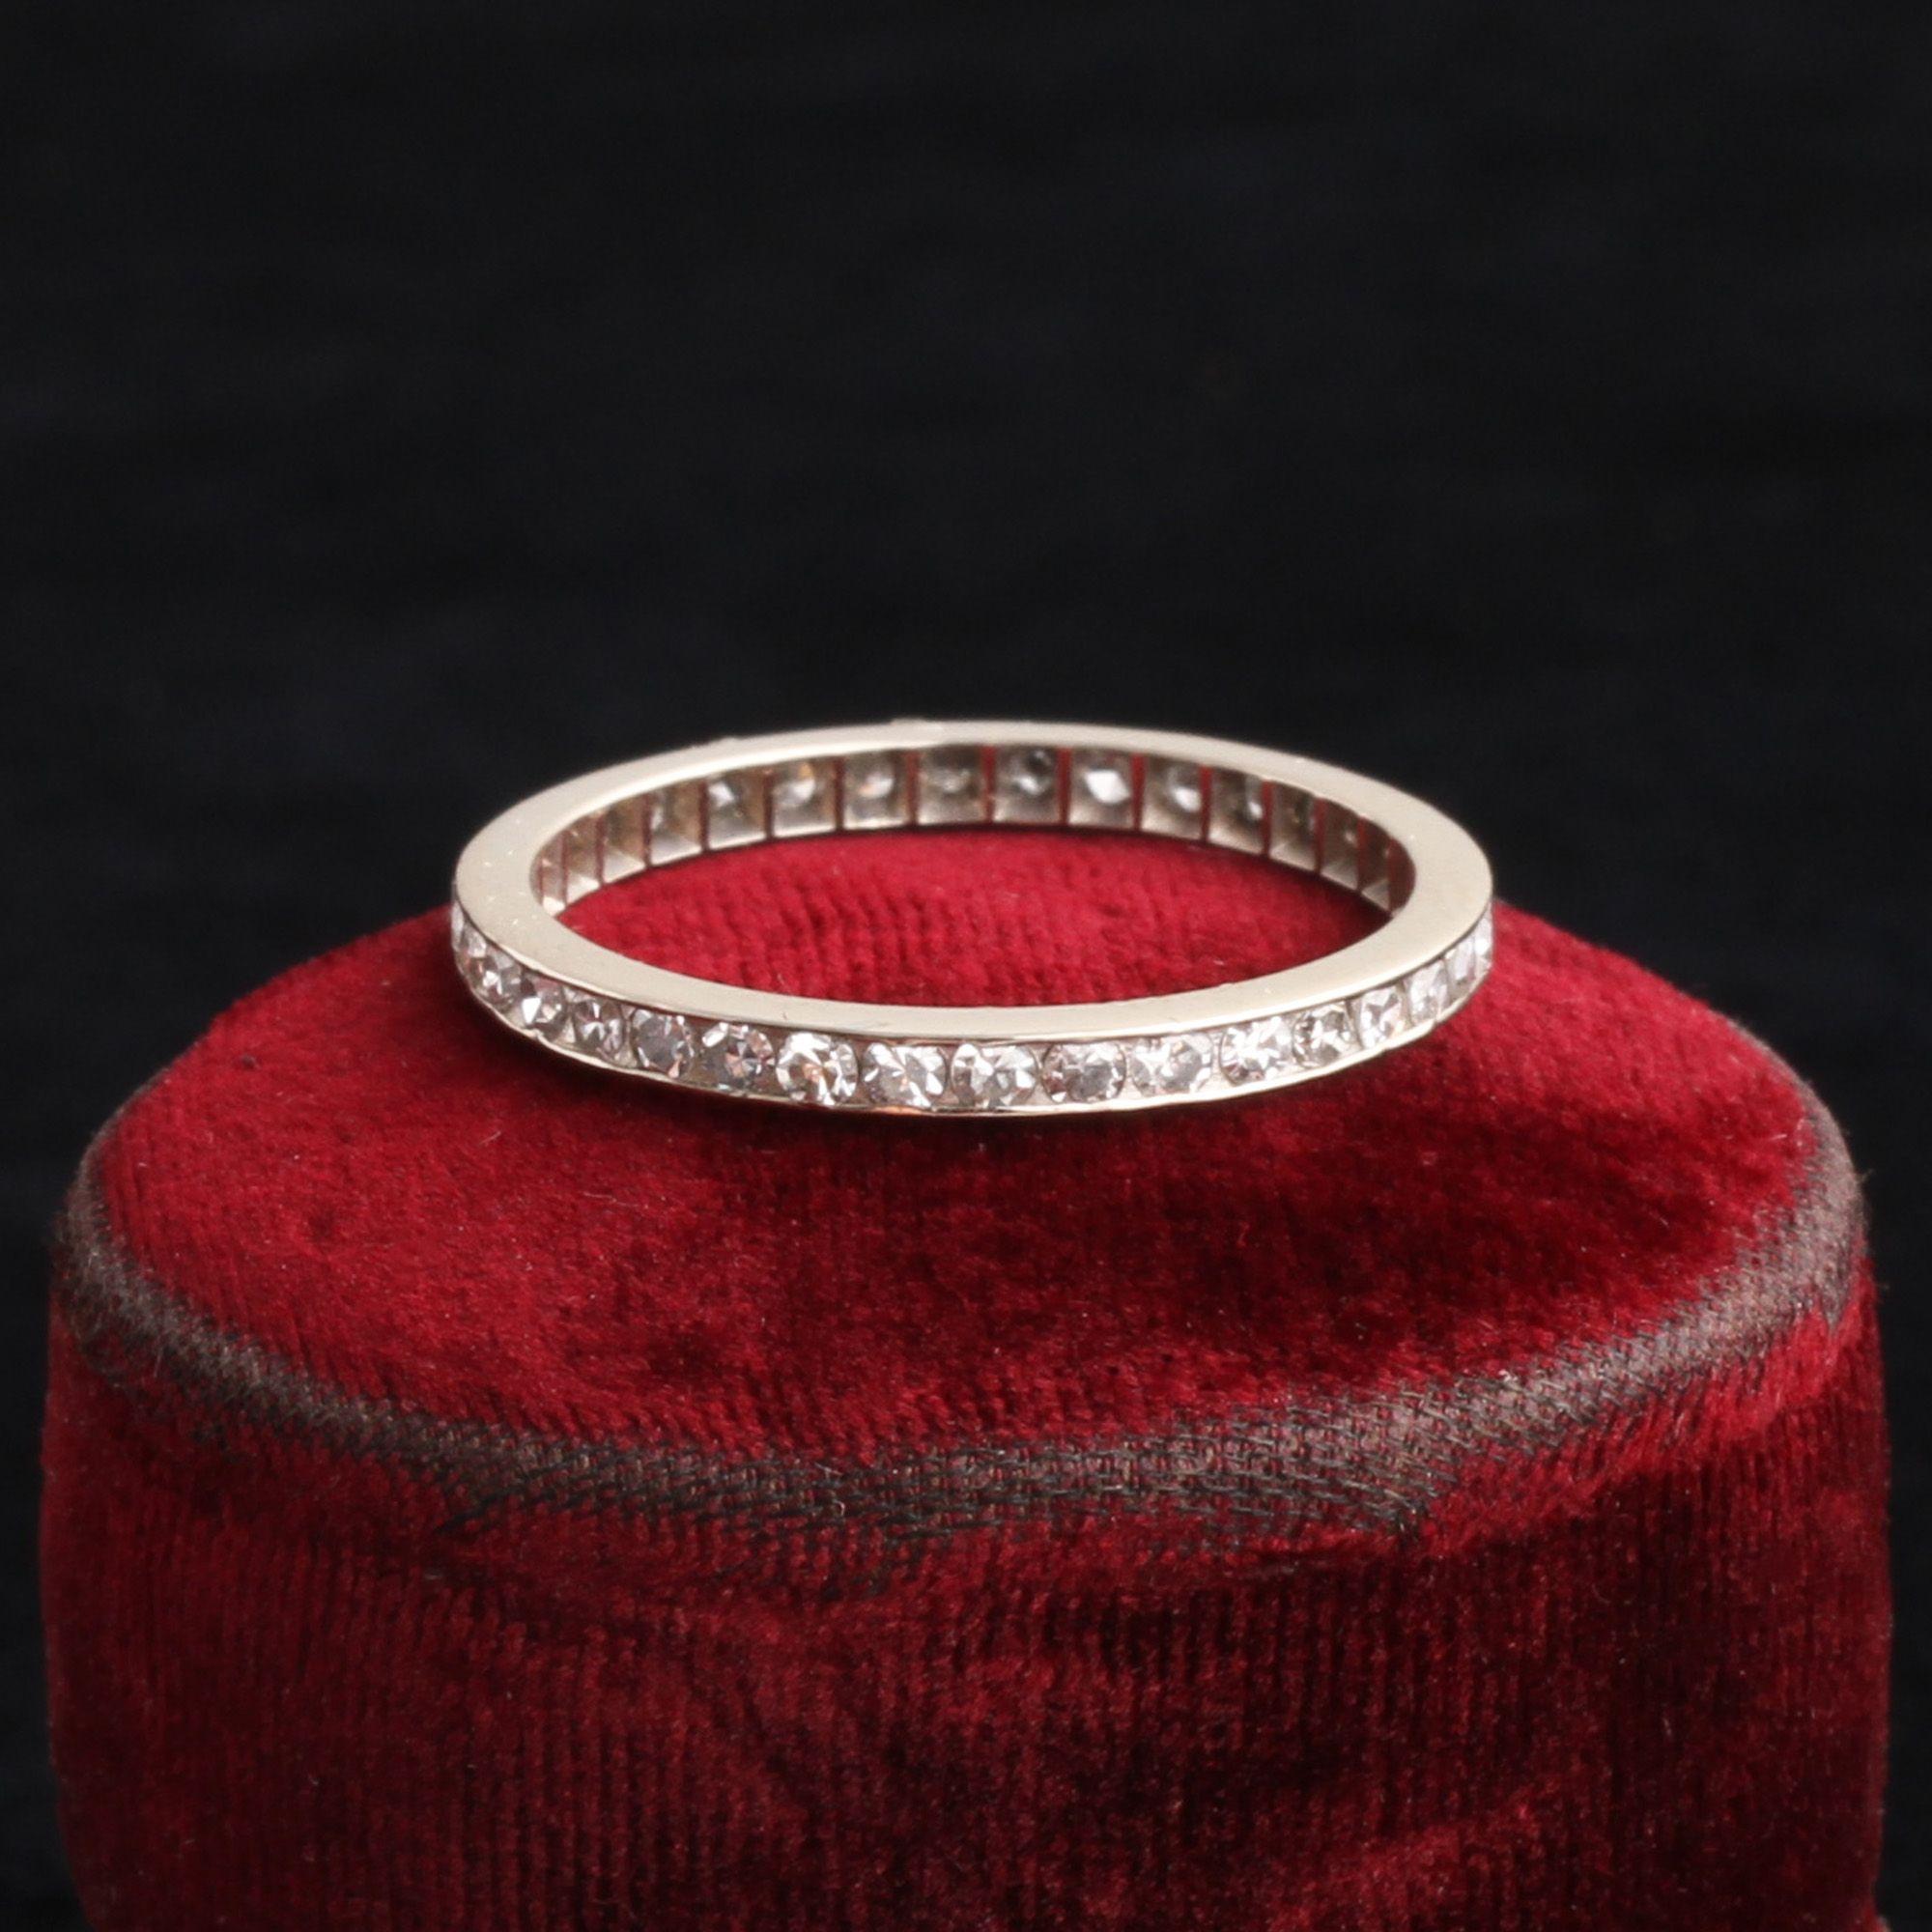 Vintage 14k White Gold Diamond Eternity Ring Size 6.5